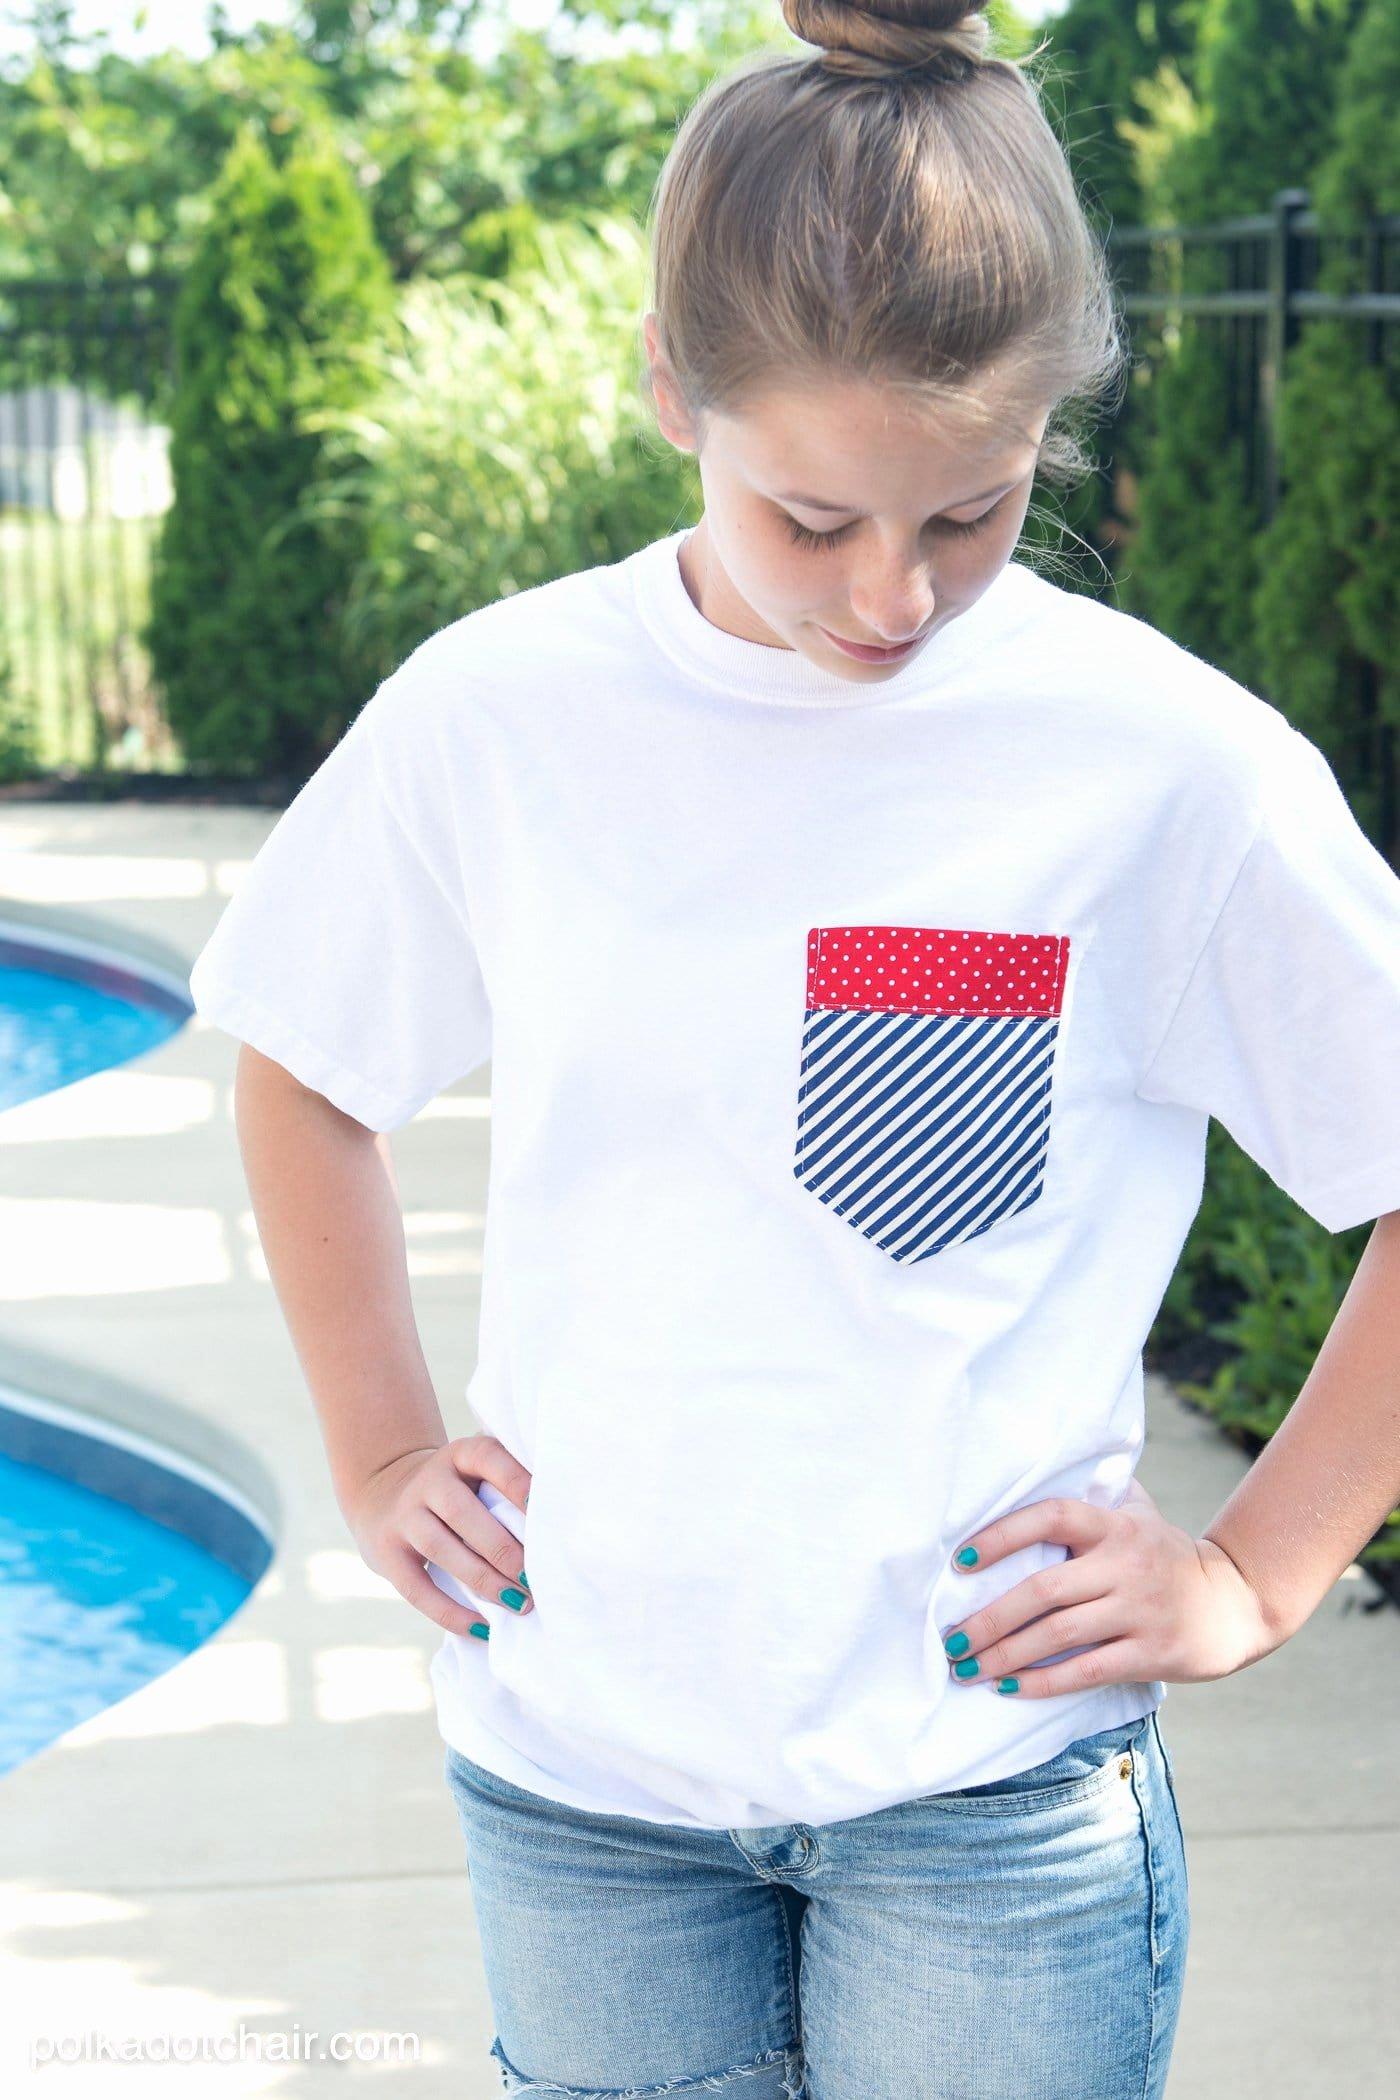 Pocket Shirt Template New Diy Pocket 4th Of July Shirts On Polkadotchair